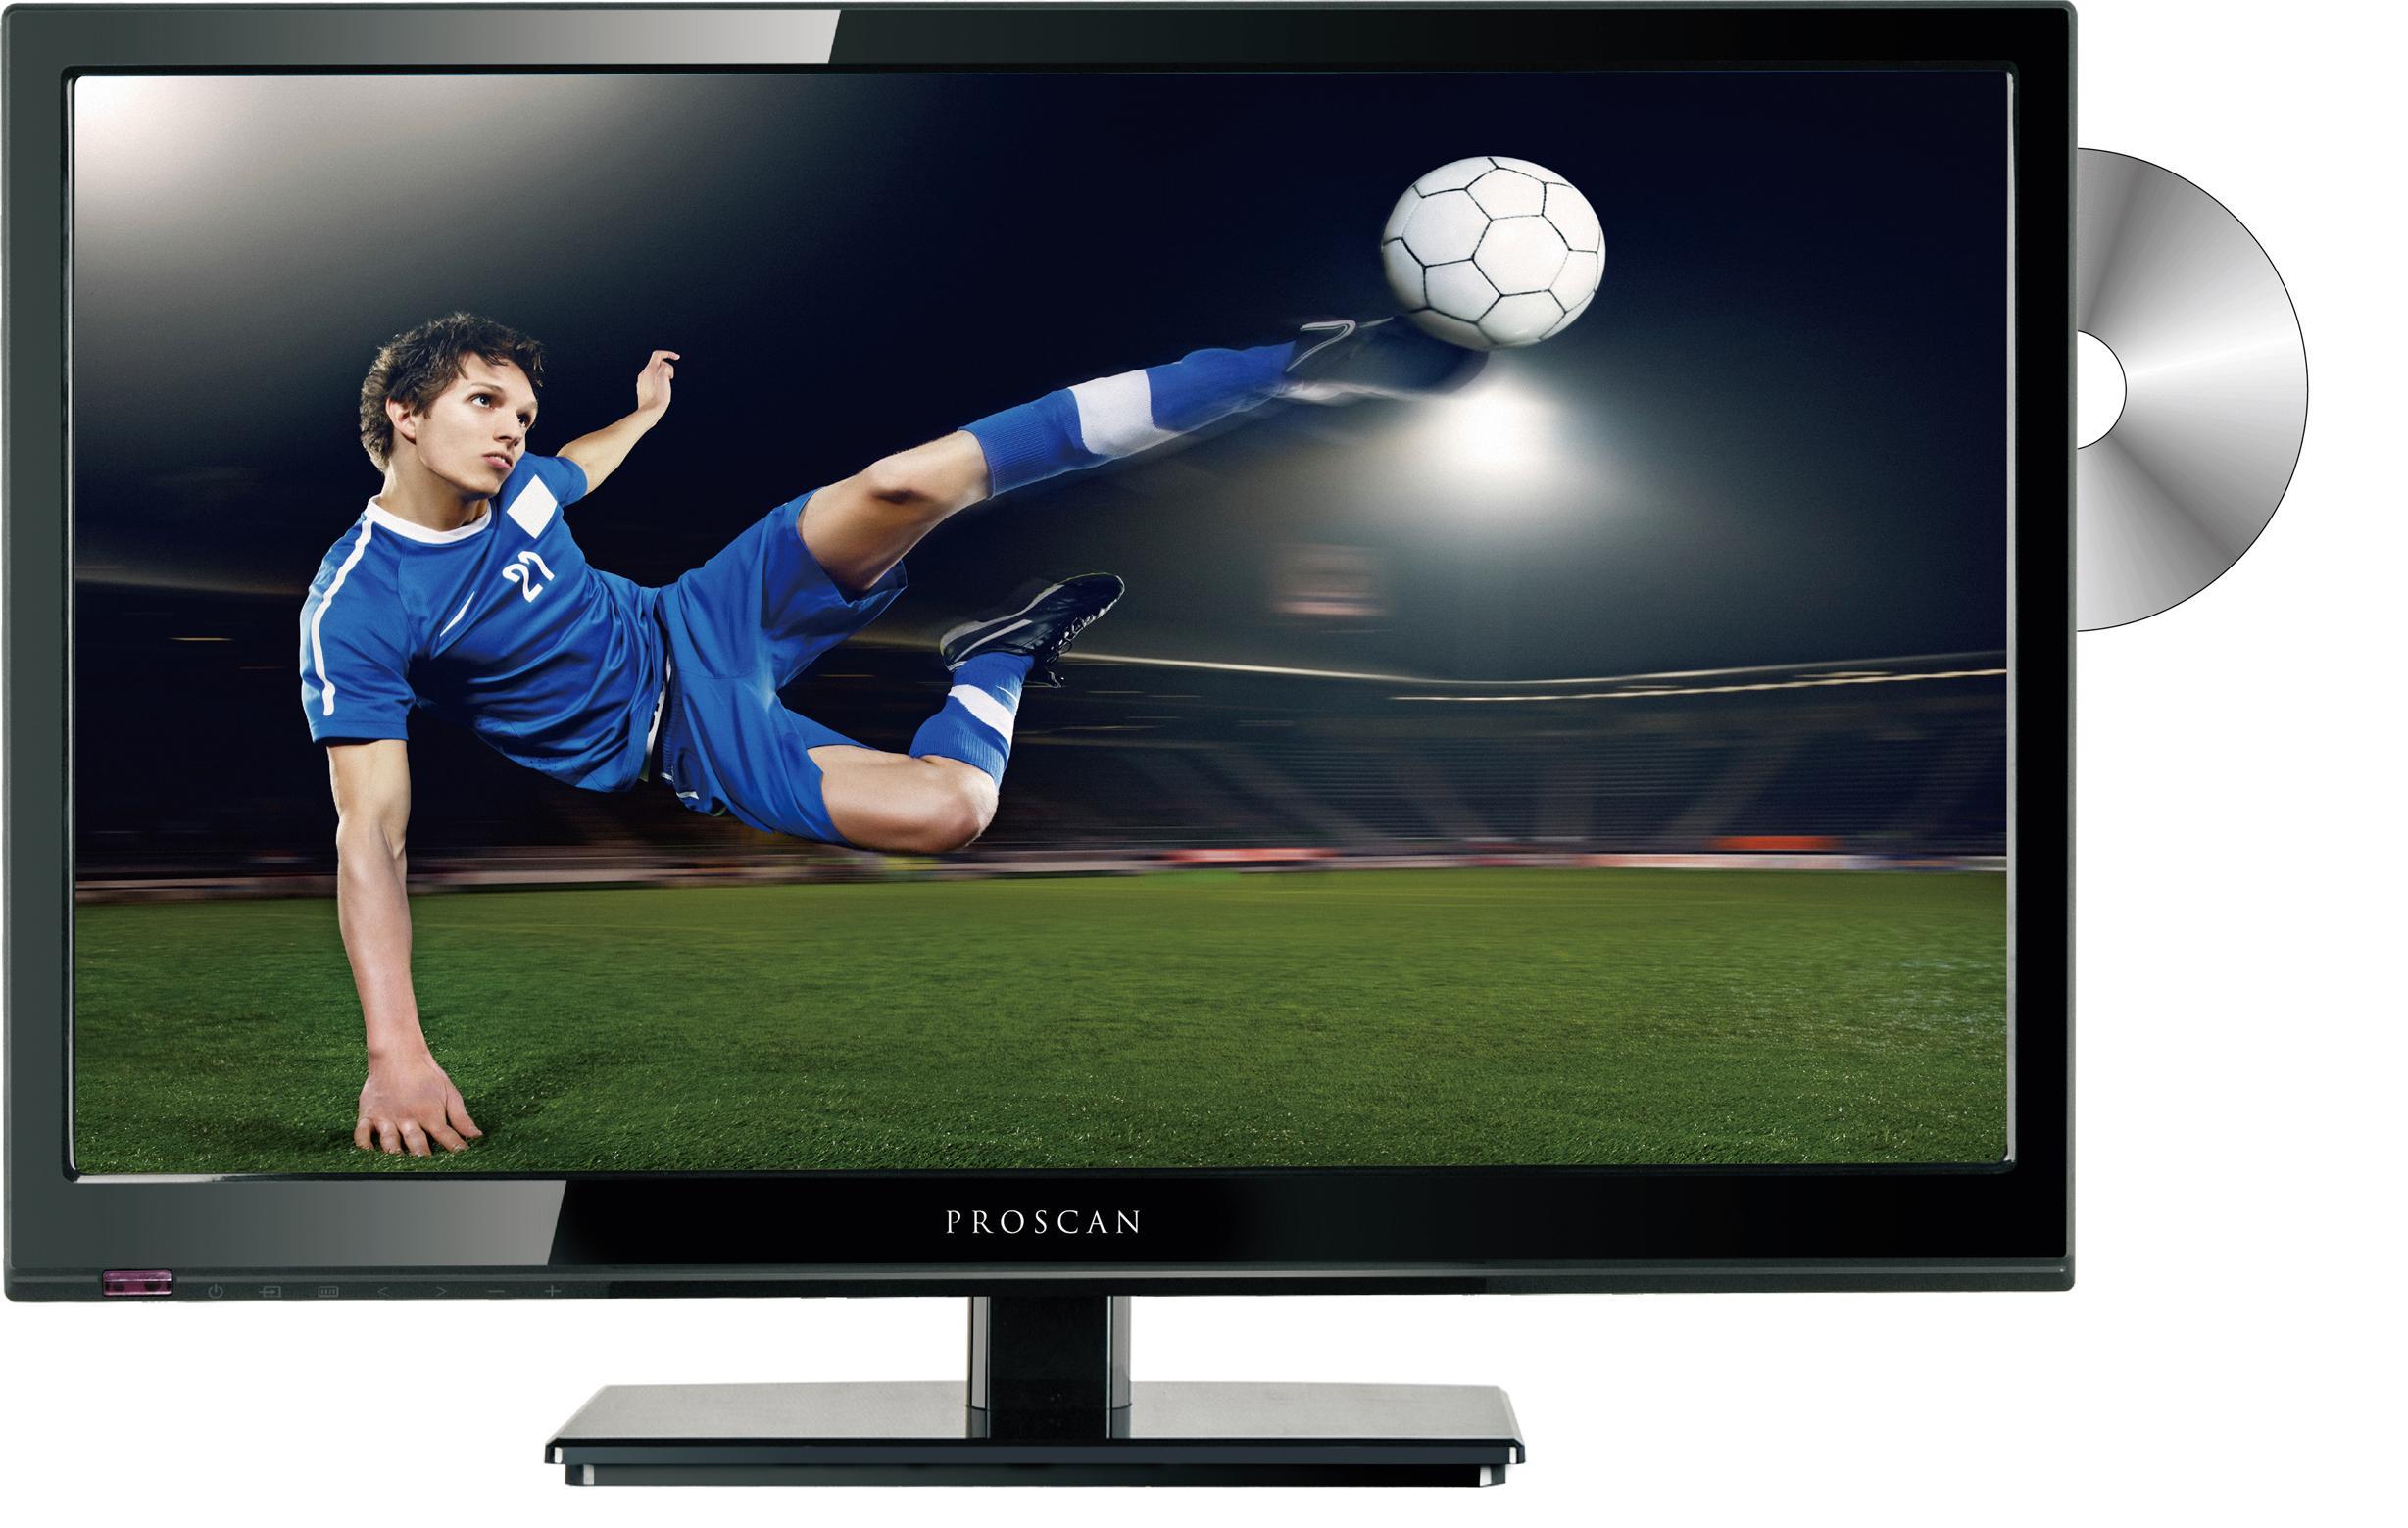 proscan pledv2213a f 22 inch 1080p 60hz led tv dvd combo electronics. Black Bedroom Furniture Sets. Home Design Ideas